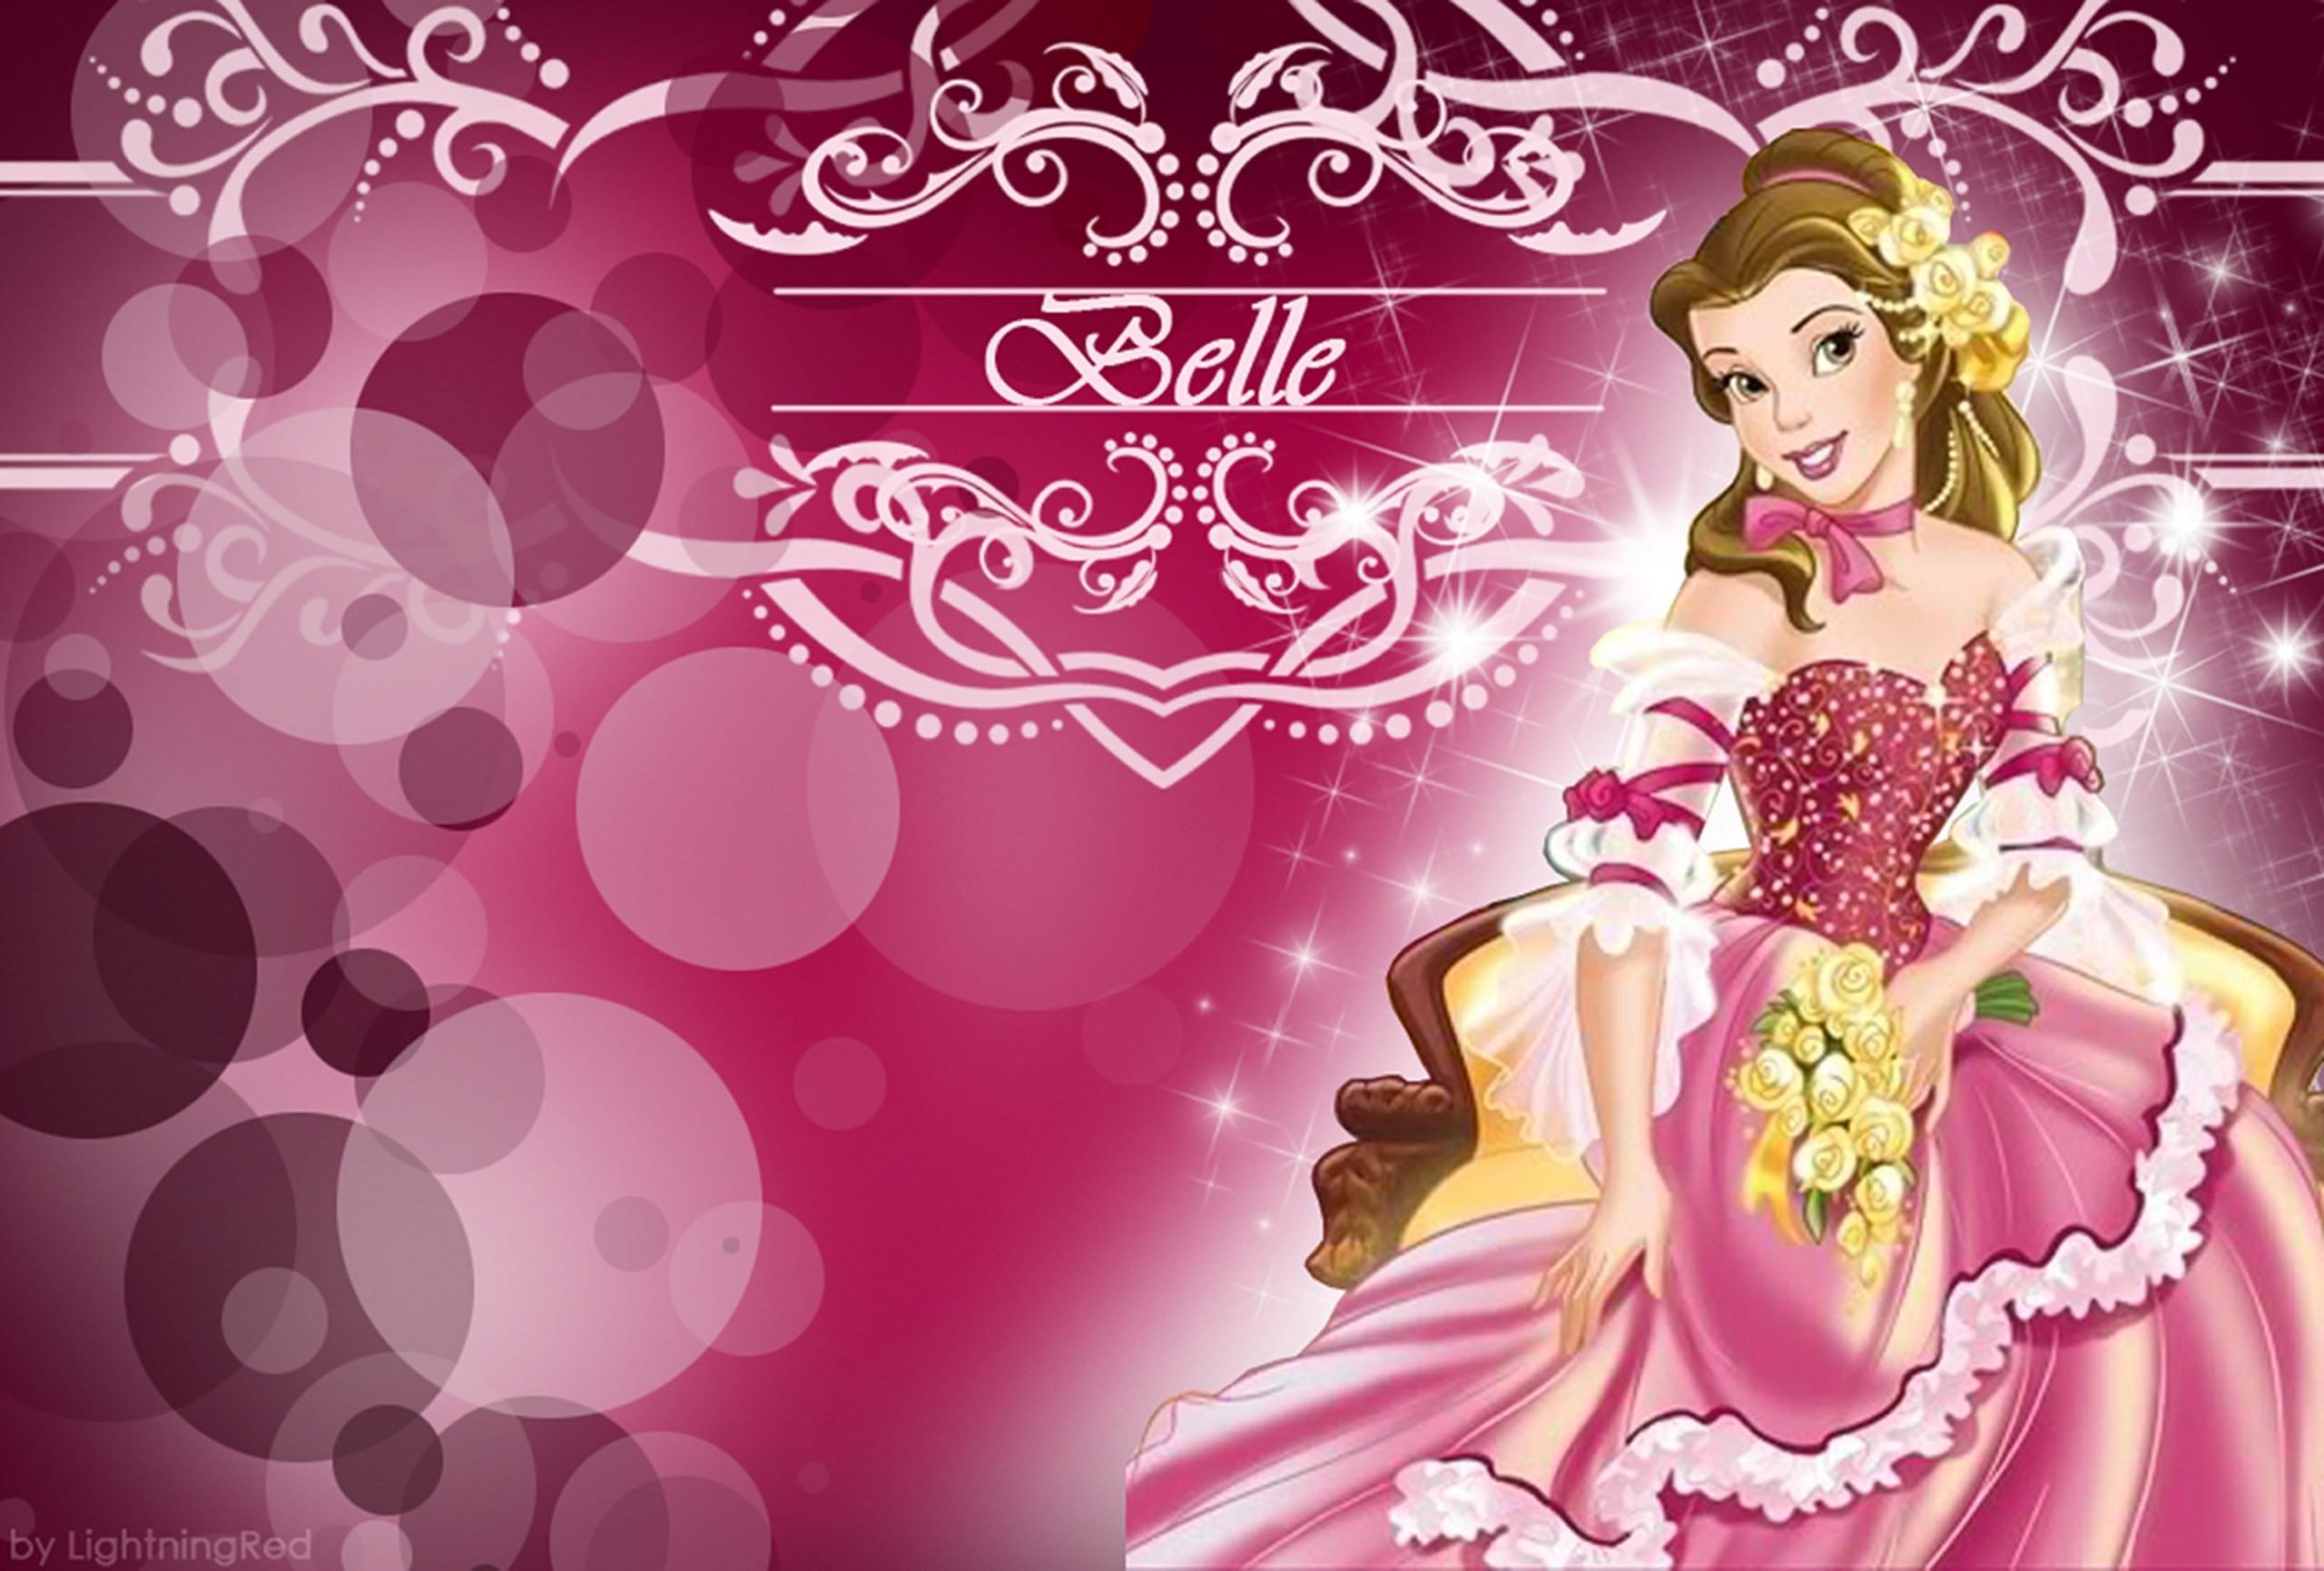 Movie Beauty And The Beast Disney Cartoon Christmas Wallpaper Source Princess Aurora 58 Images